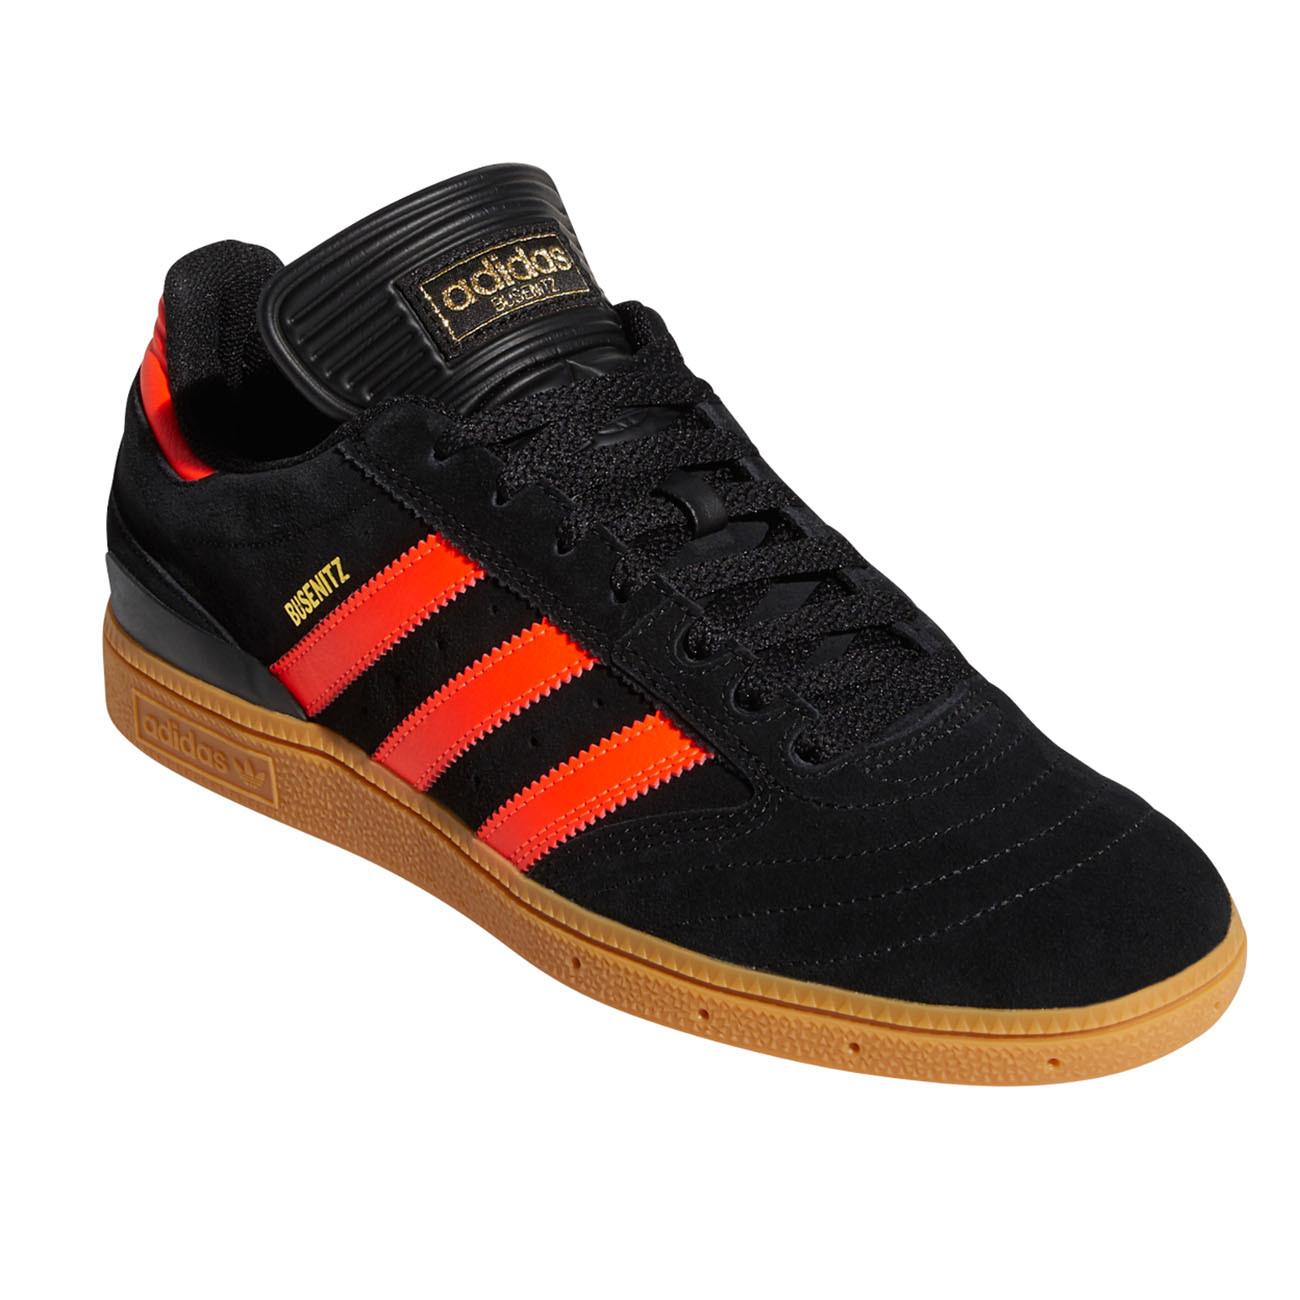 Adidas Busenitz Skate shoes Adidas Busenitz core black/solar red/gum | Snowboard ...